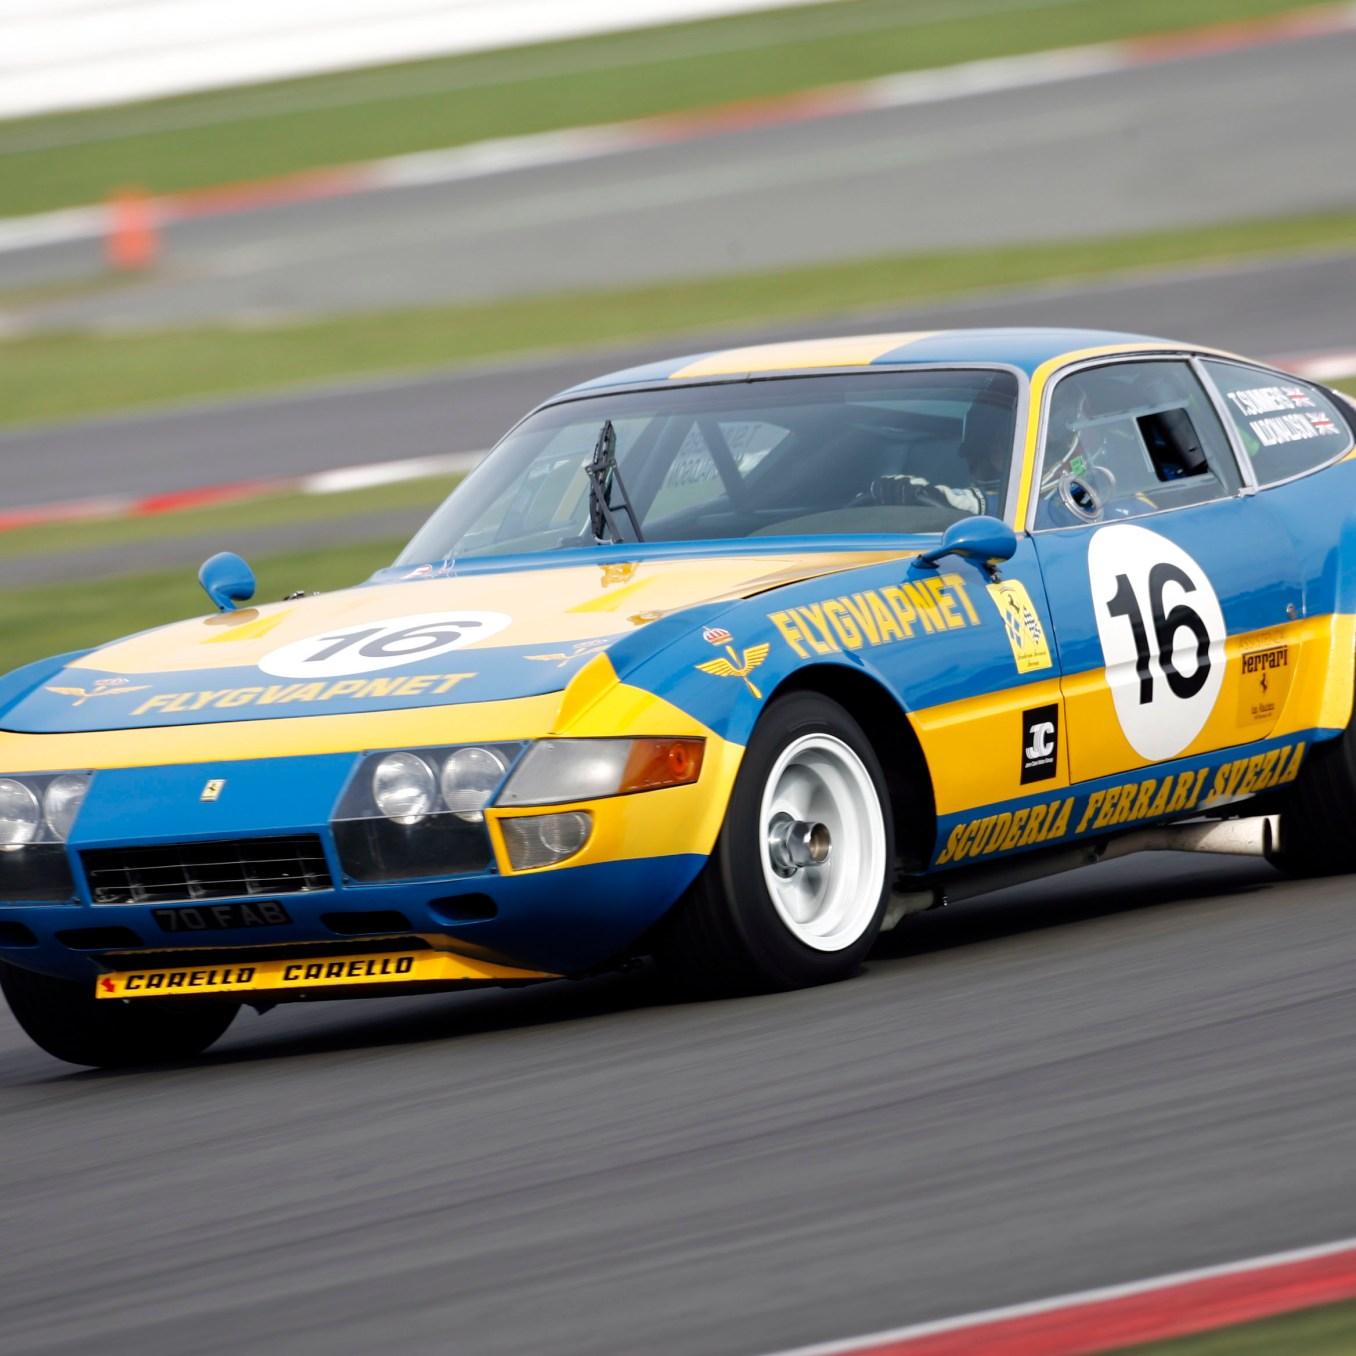 Donaldson/Summers Ferrari 365 GTB Daytona